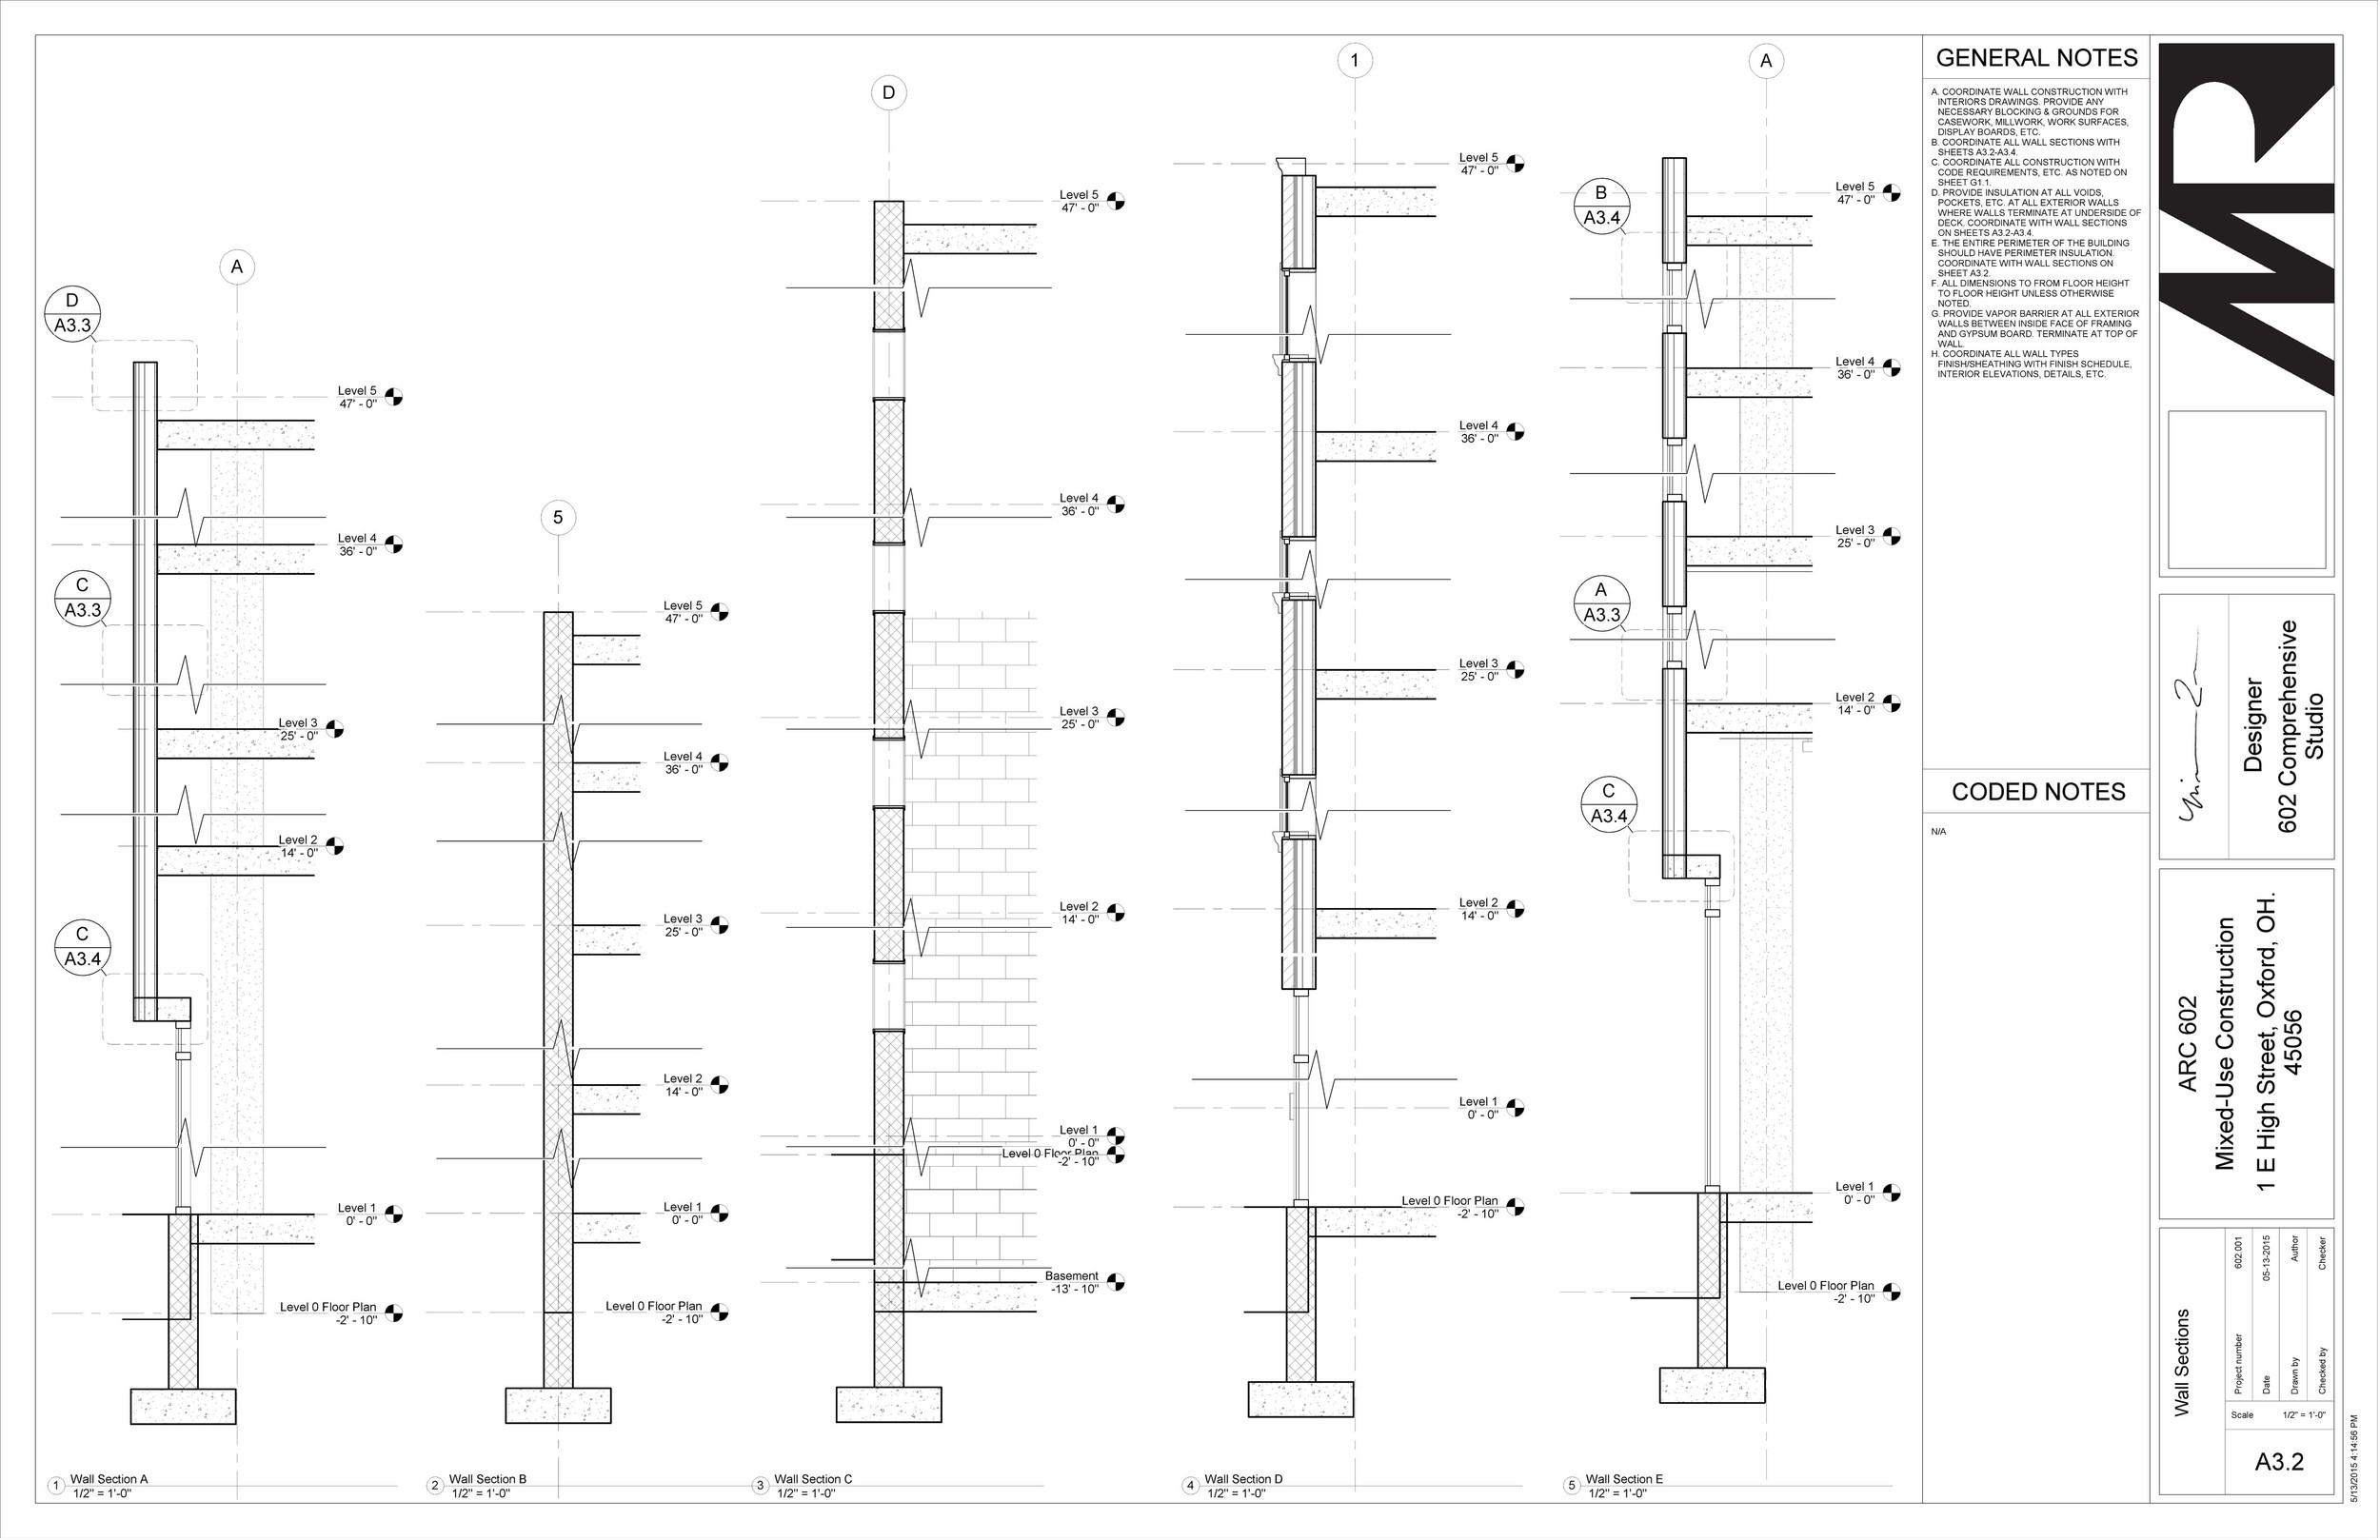 602 Studio - Sheet - A3-2 - Wall Sections.jpg